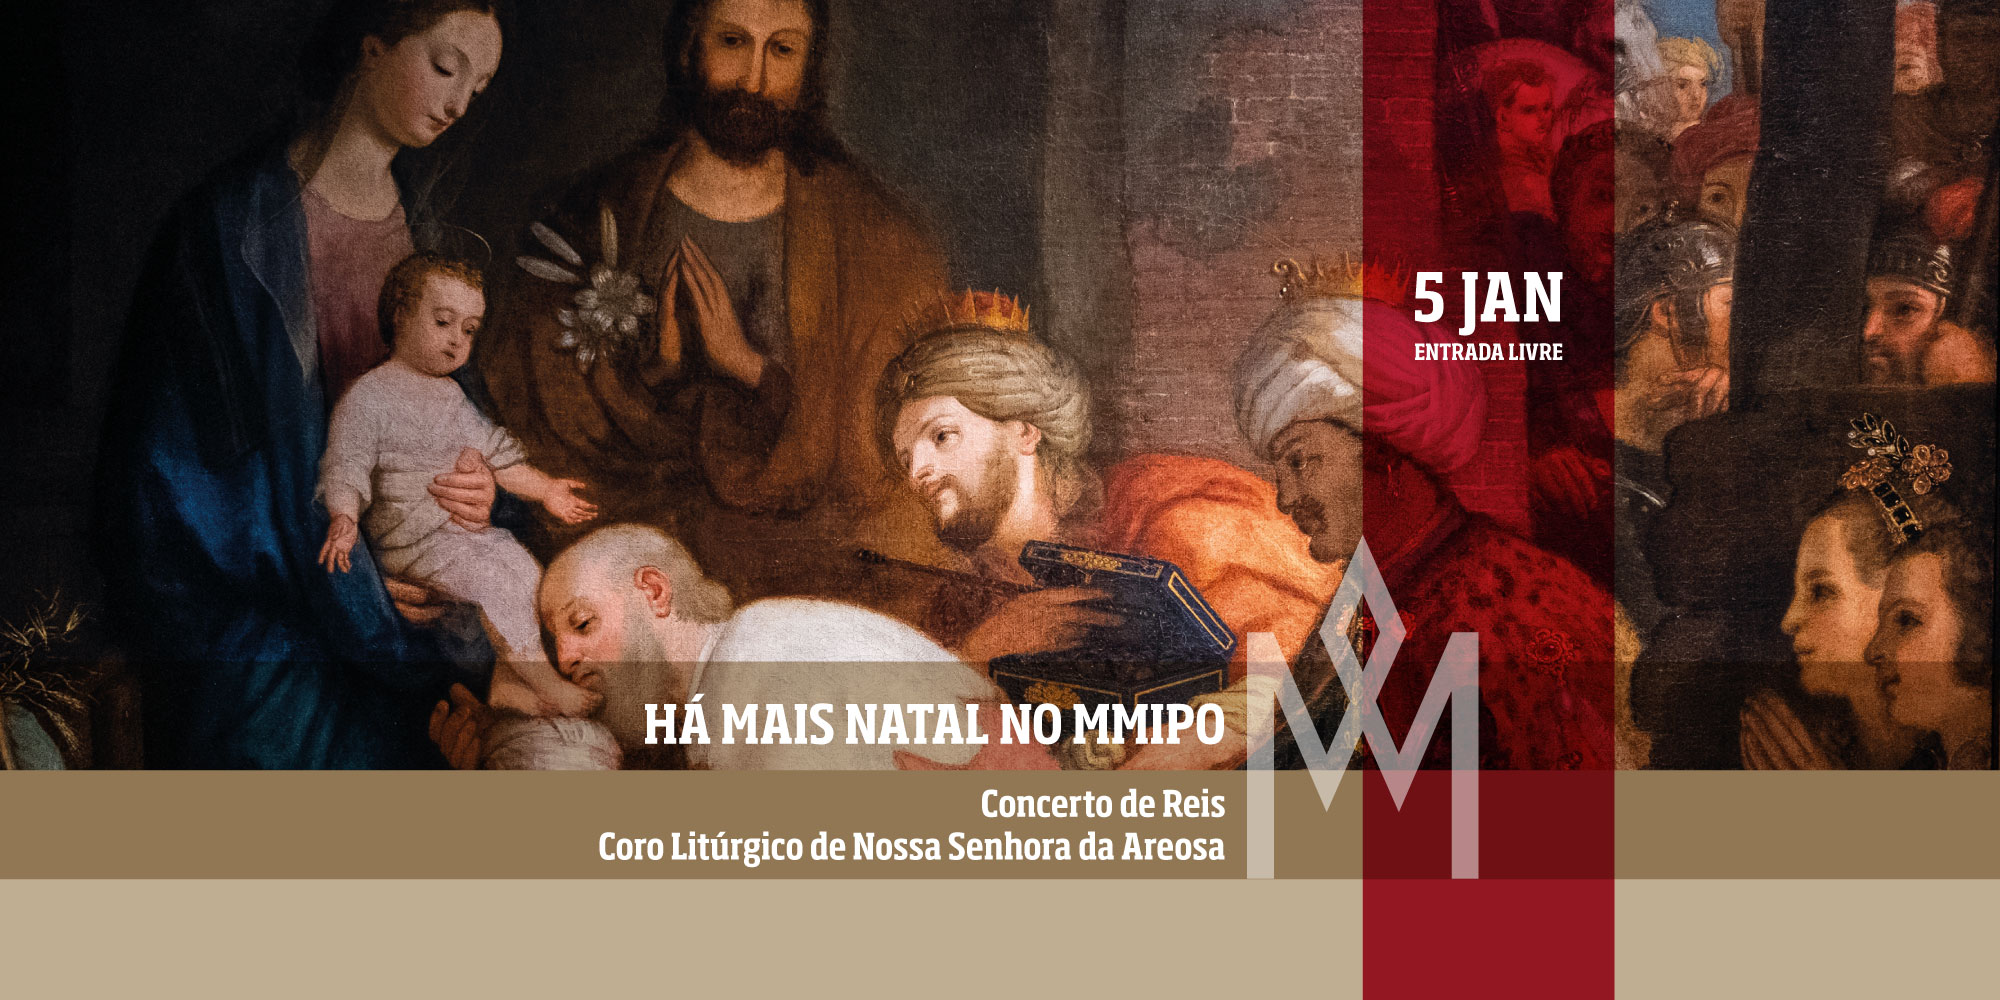 http://www.mmipo.pt/assets/misc/slideshow/2018/MMIPO-natal-bannersite-concertoreis.jpg